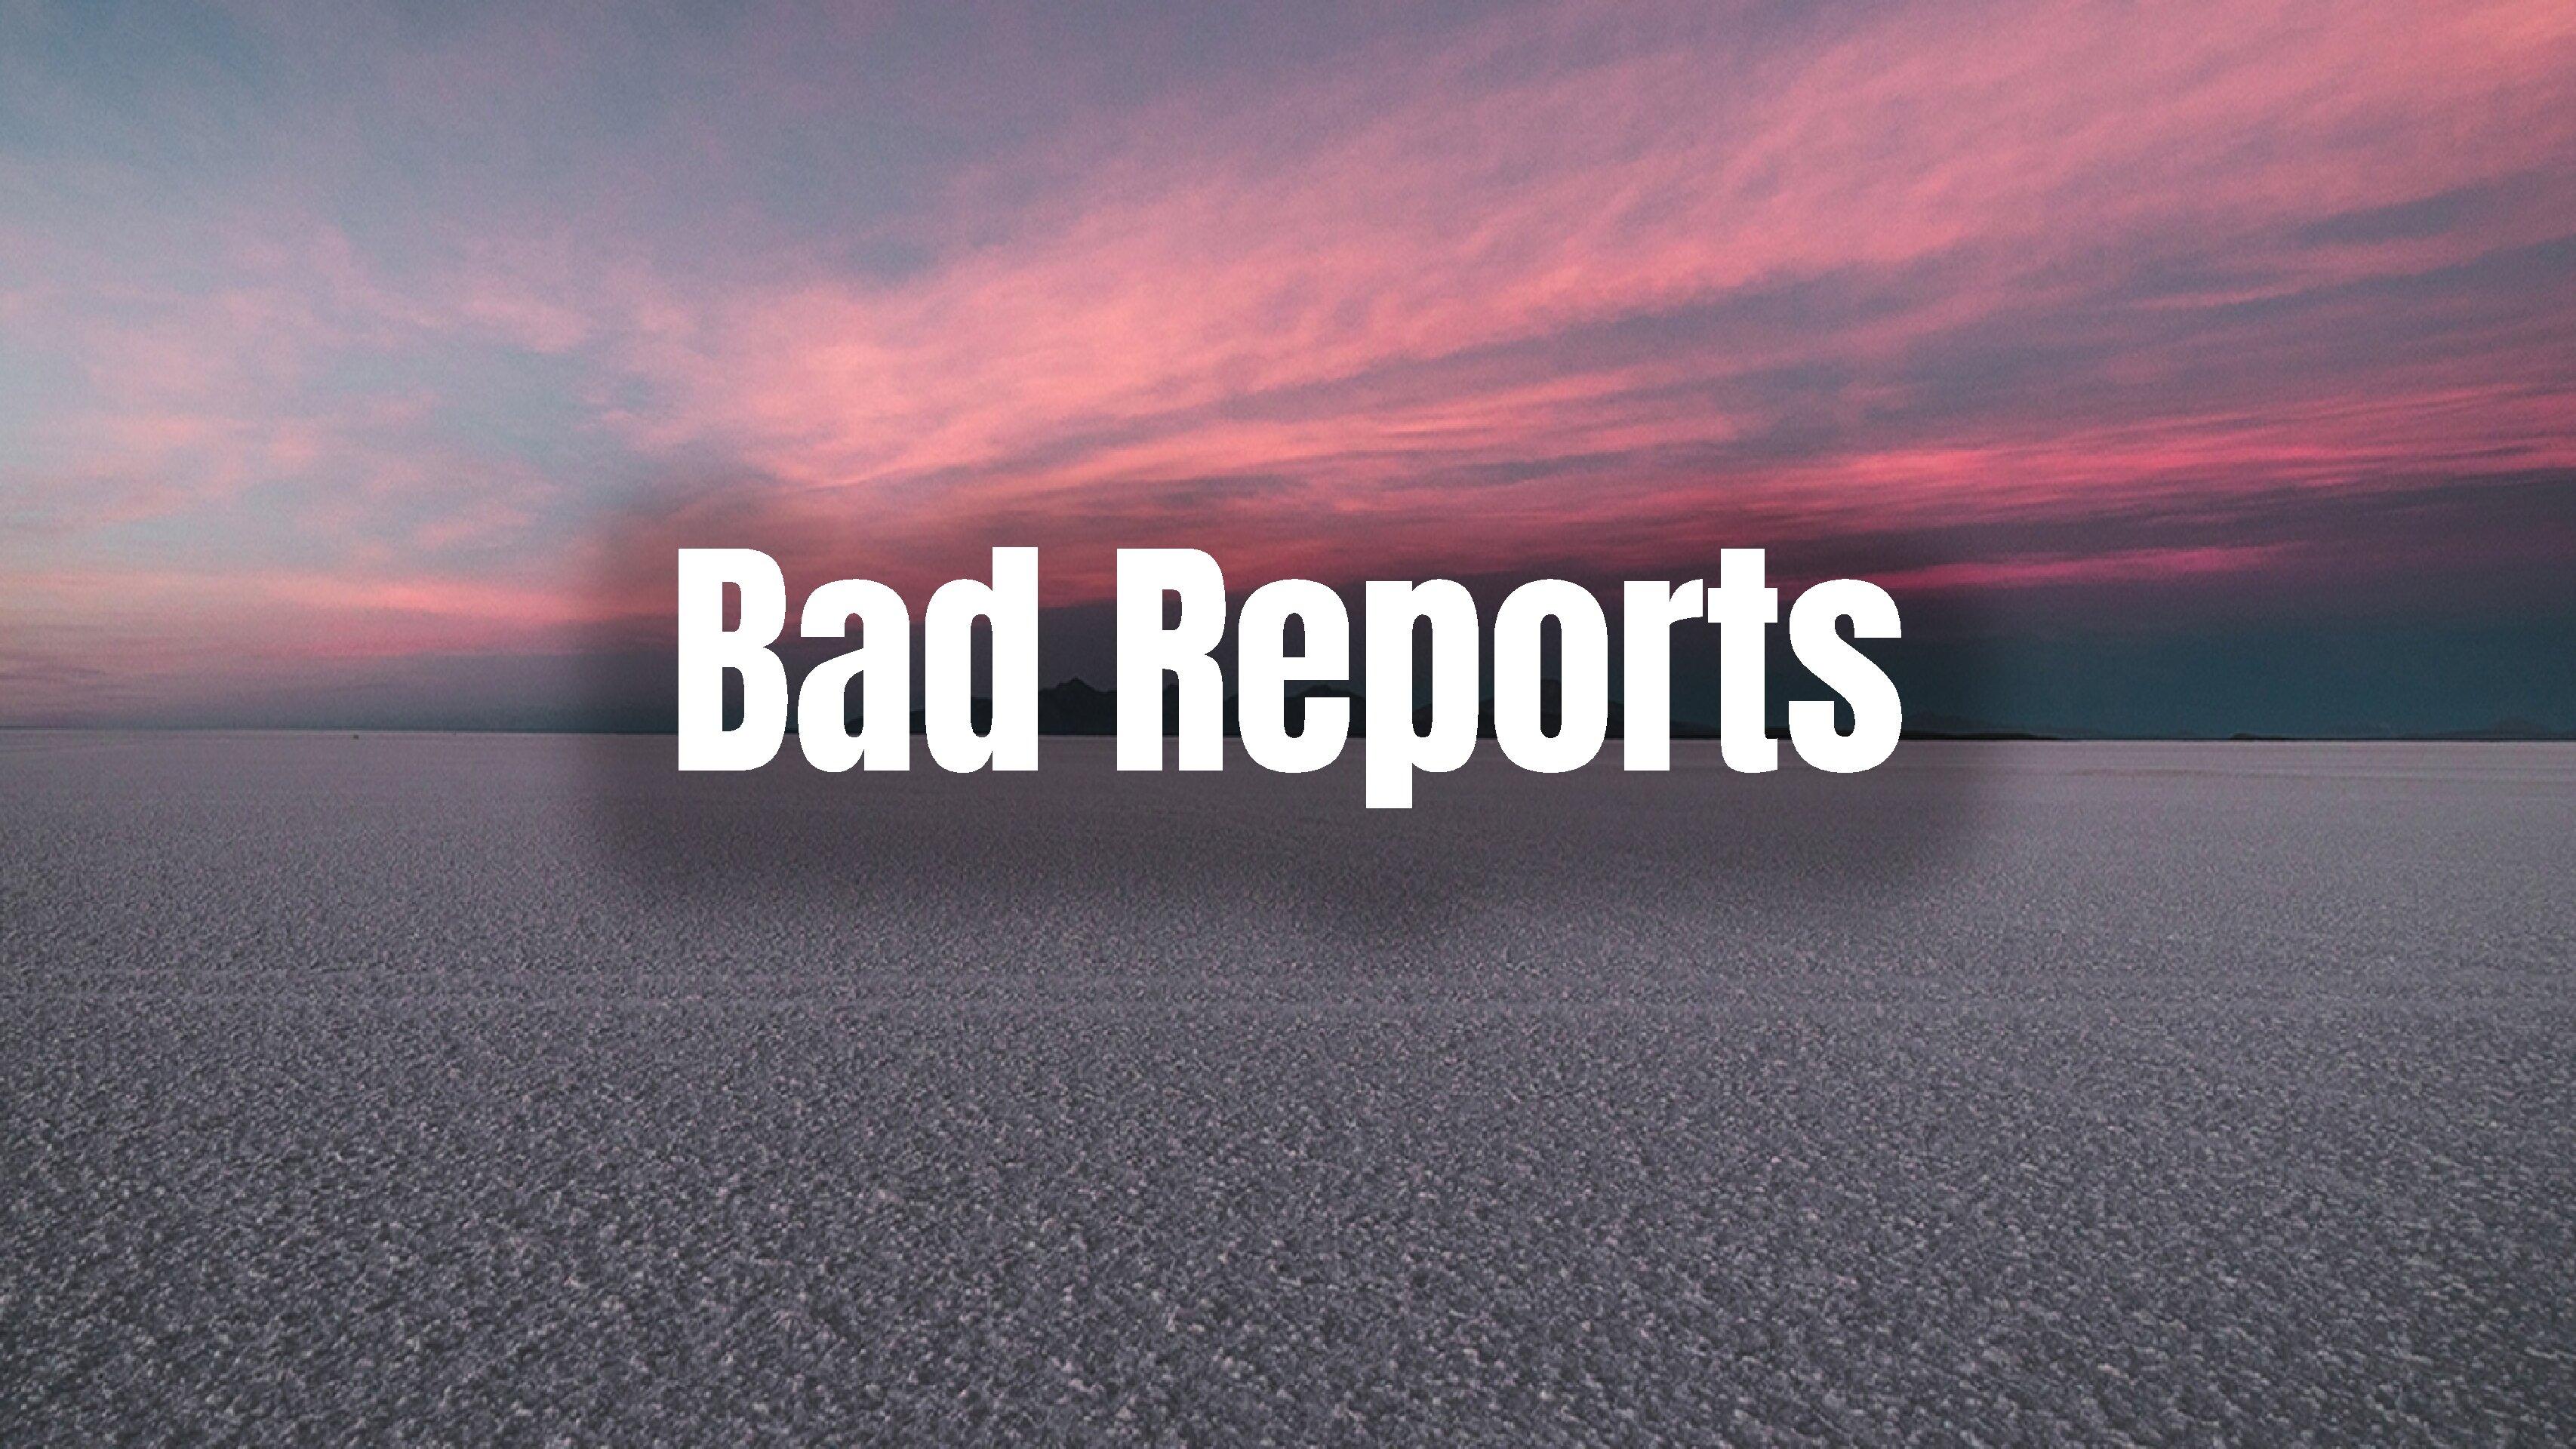 Bad Reports